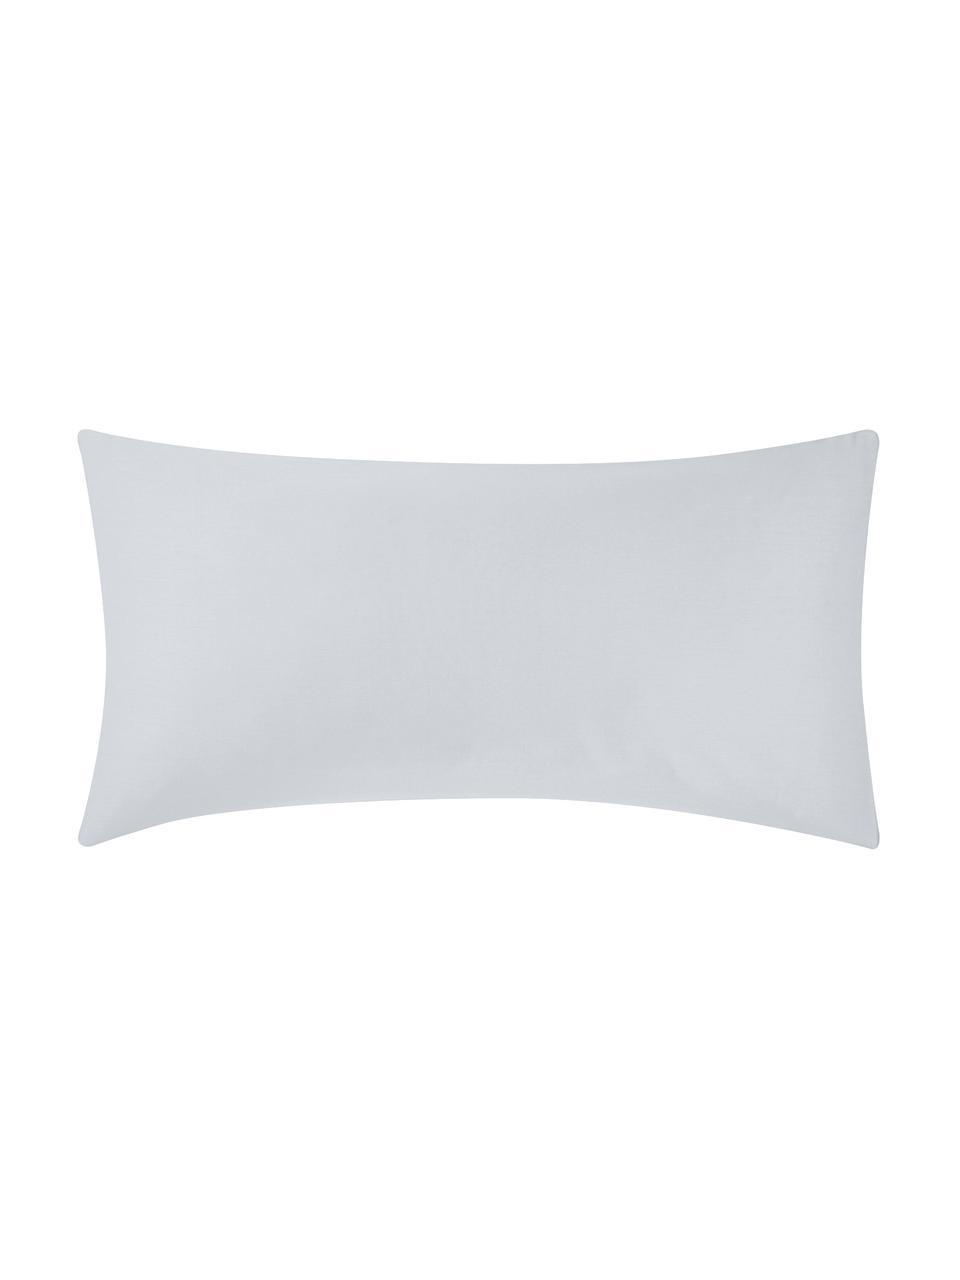 Baumwollsatin-Kissenbezüge Comfort in Hellgrau, 2 Stück, Webart: Satin Fadendichte 250 TC,, Hellgrau, 40 x 80 cm